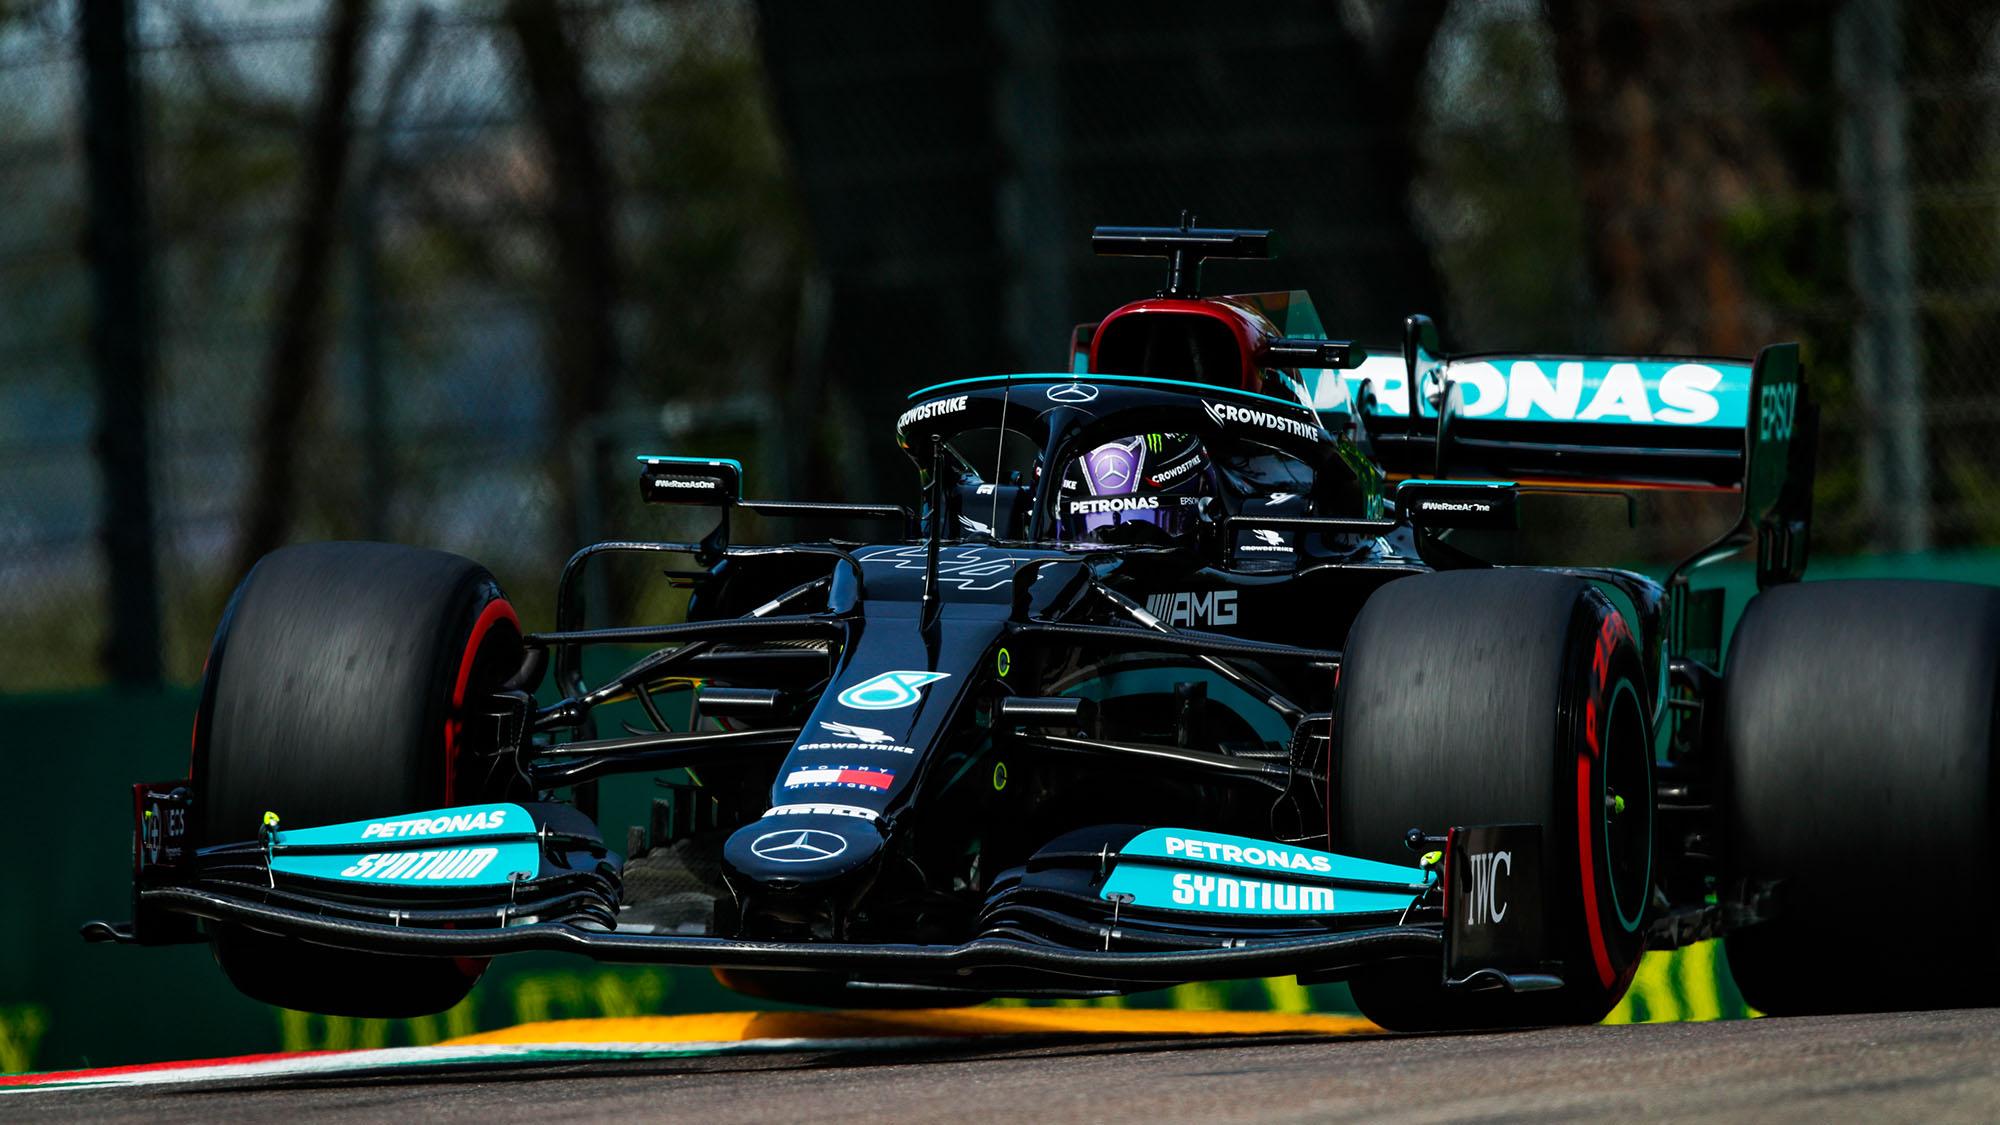 Hamilton lead